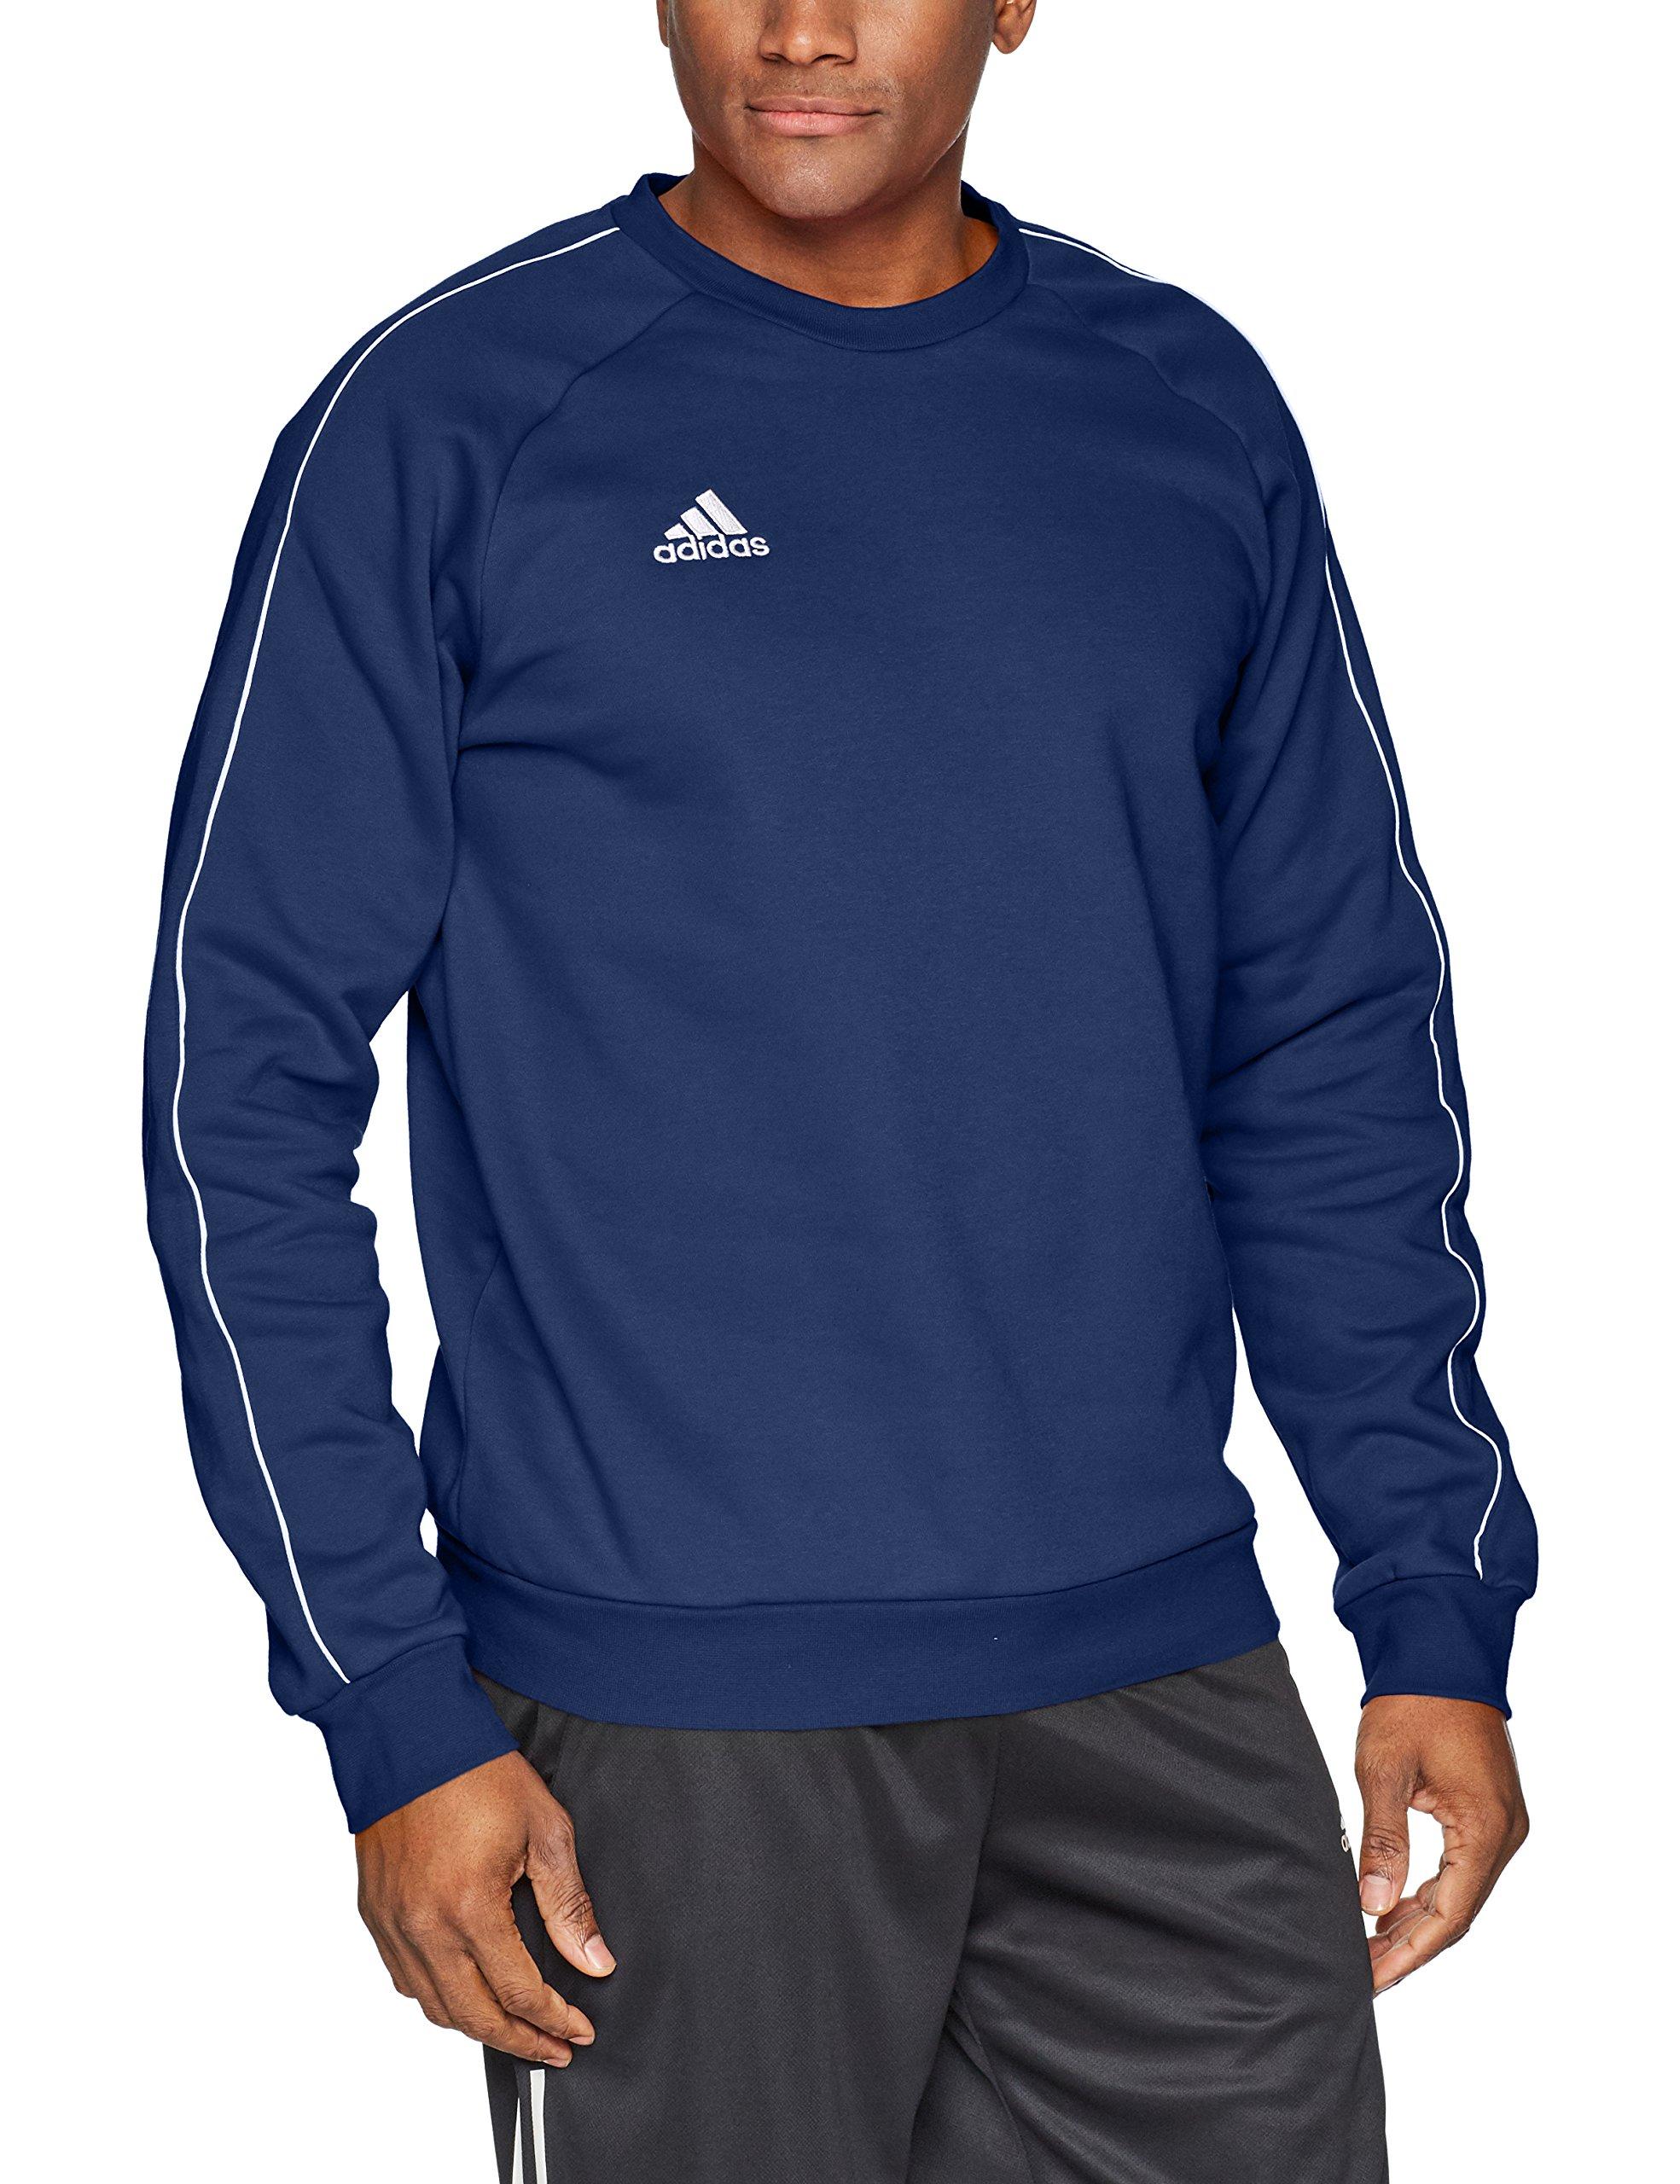 adidas Men's Core 18 Soccer Sweatshirt, Dark Blue/White, X-Small